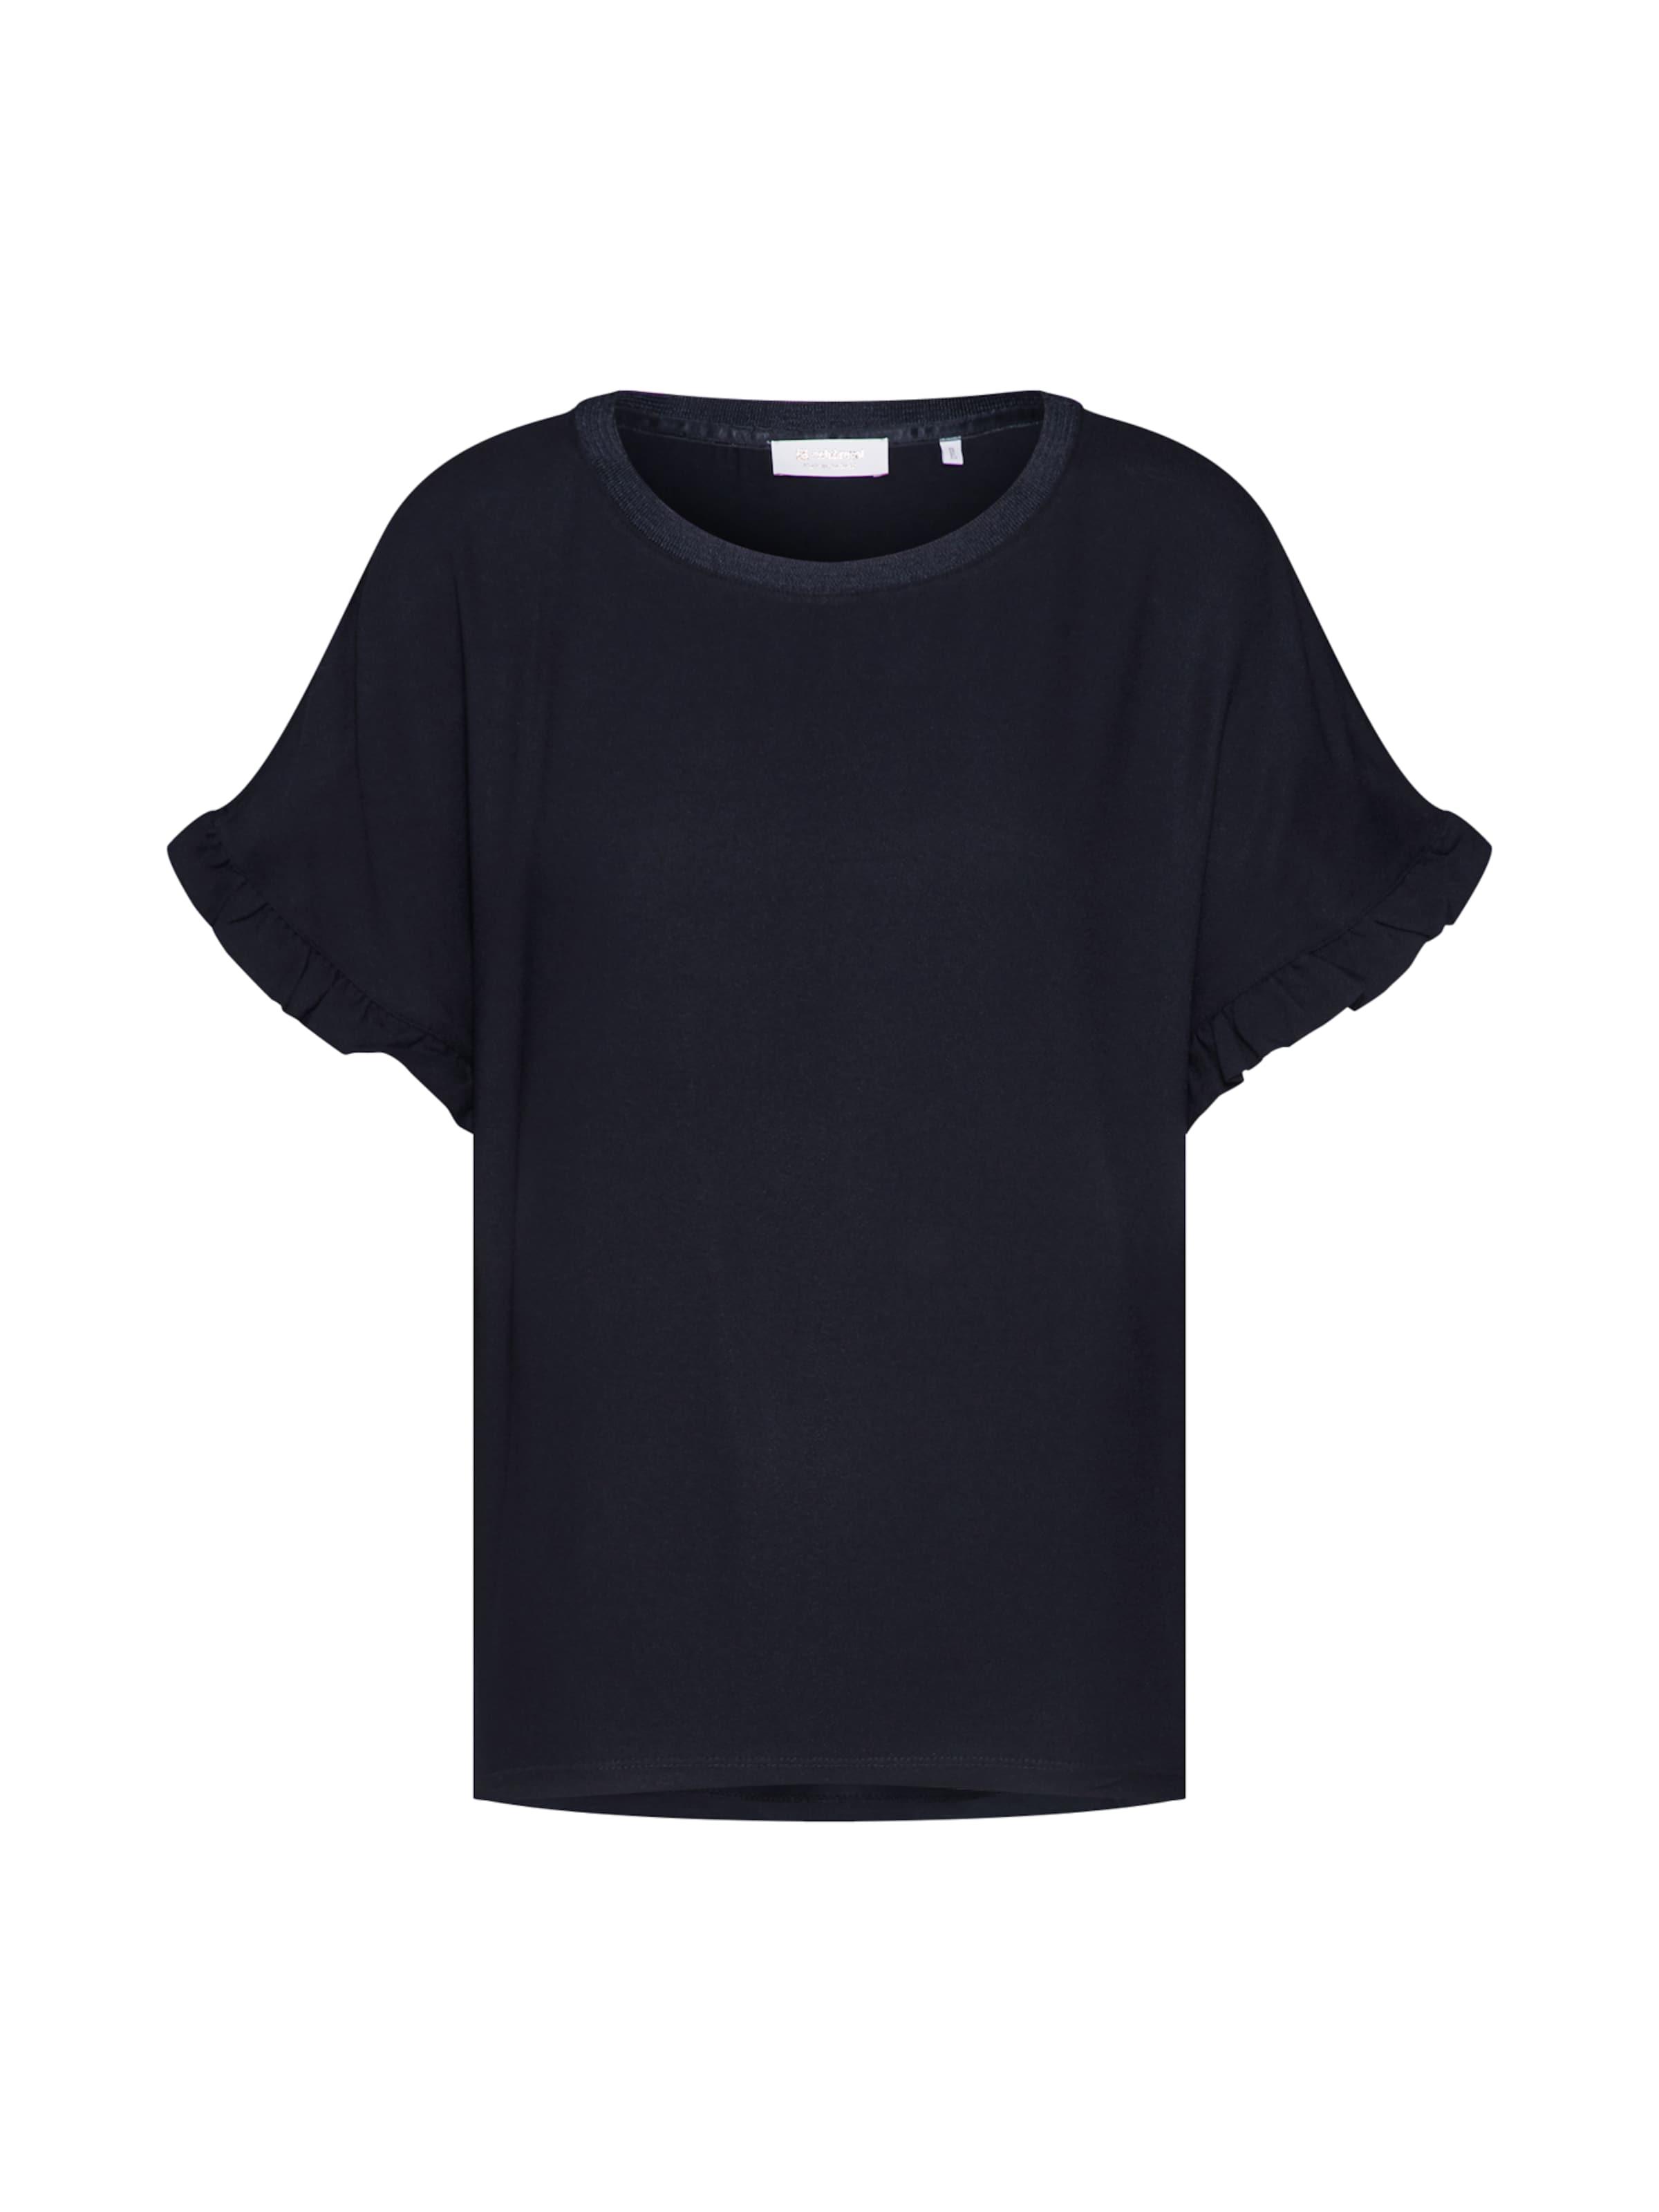 Royal Noir En Richamp; T shirt uPOikXZ